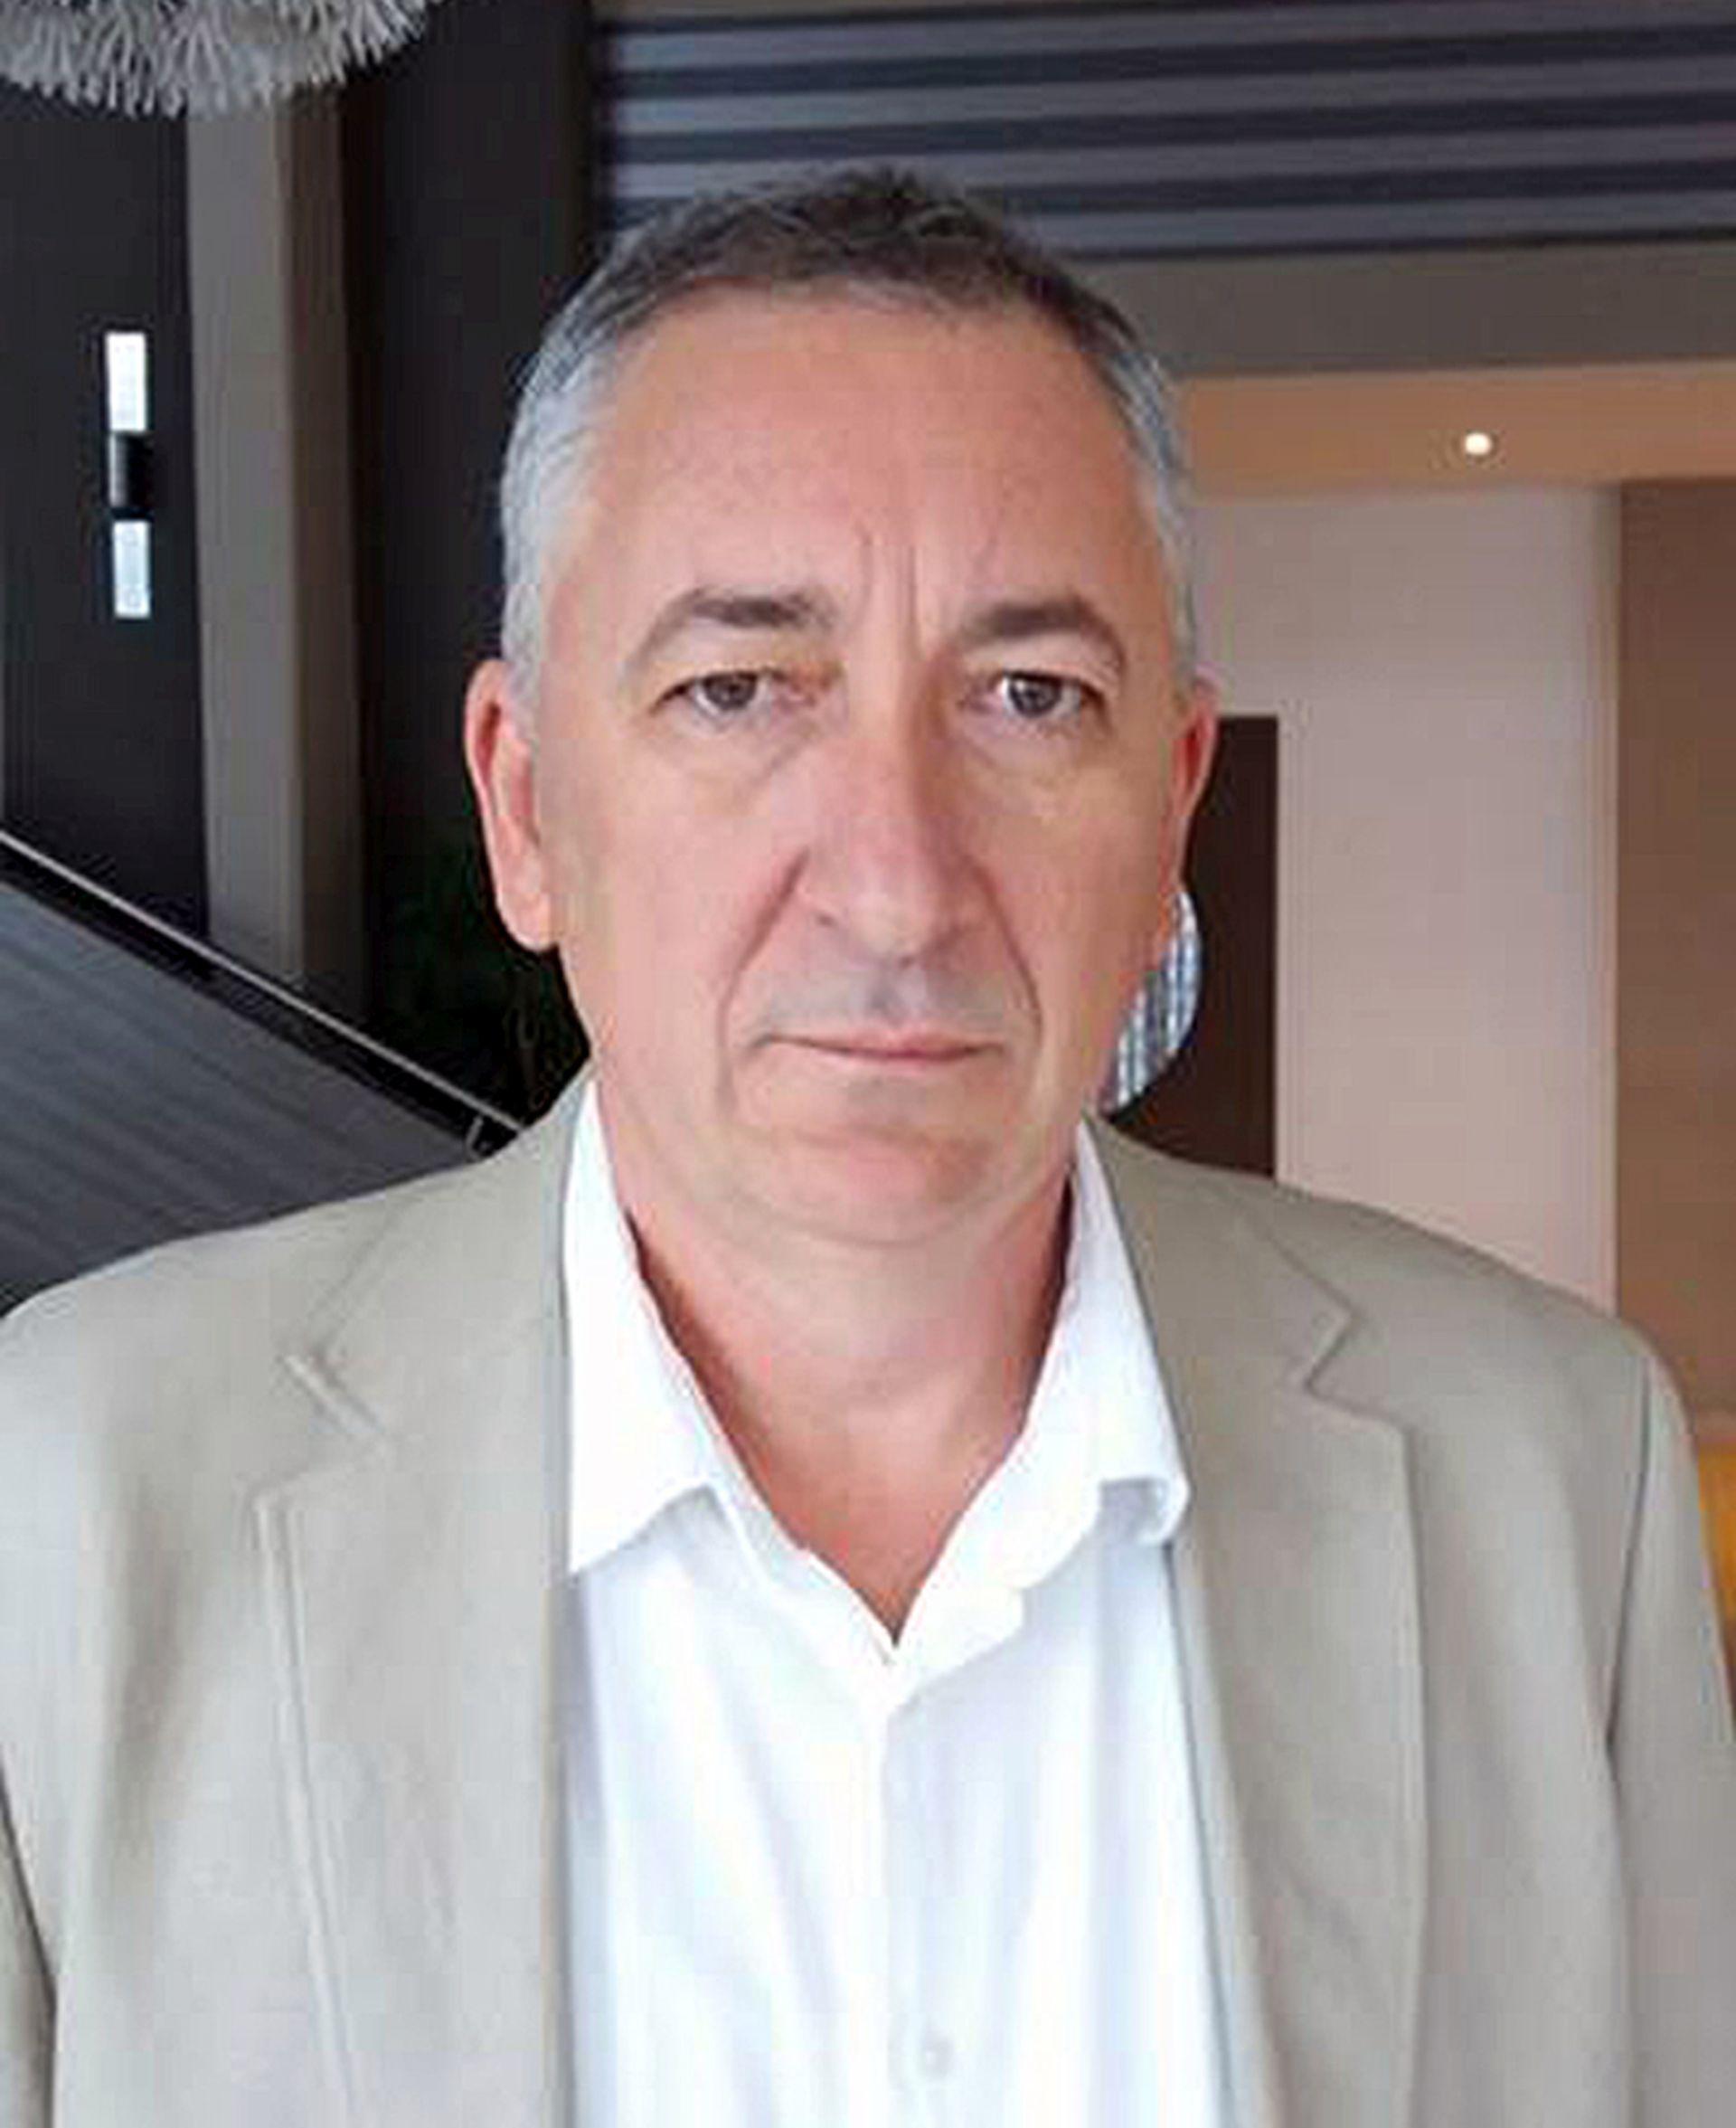 AGROKOR Paradiš (PPDIV) pozdravlja dogovor s dobavljačima i bankama